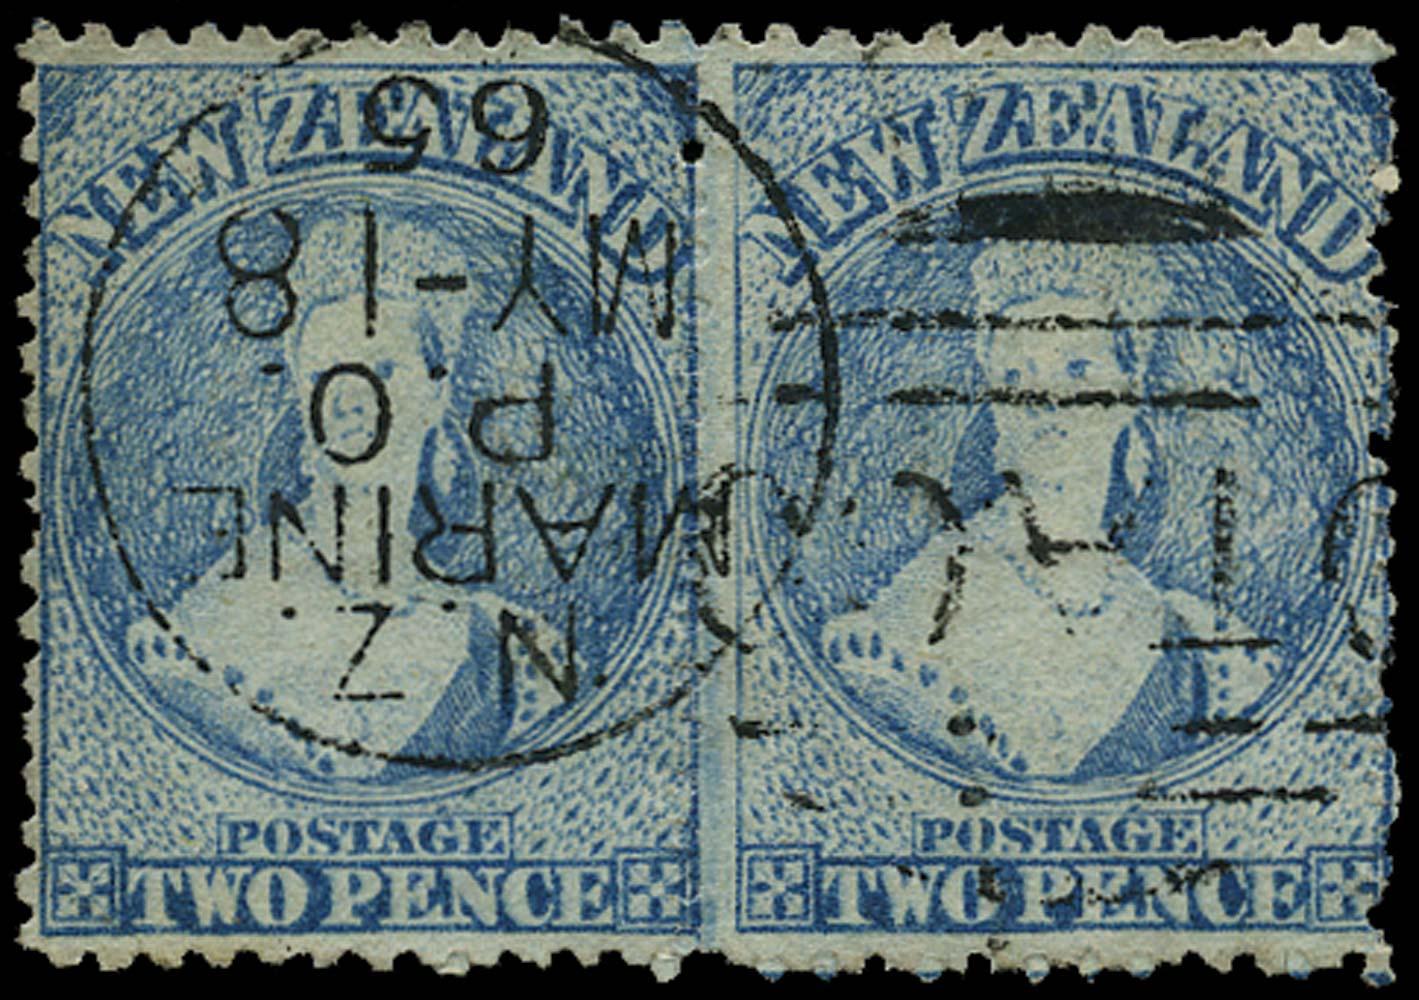 NEW ZEALAND 1864  SG105 Used 2d pale blue Otago Marine P.O. paquebot duplex